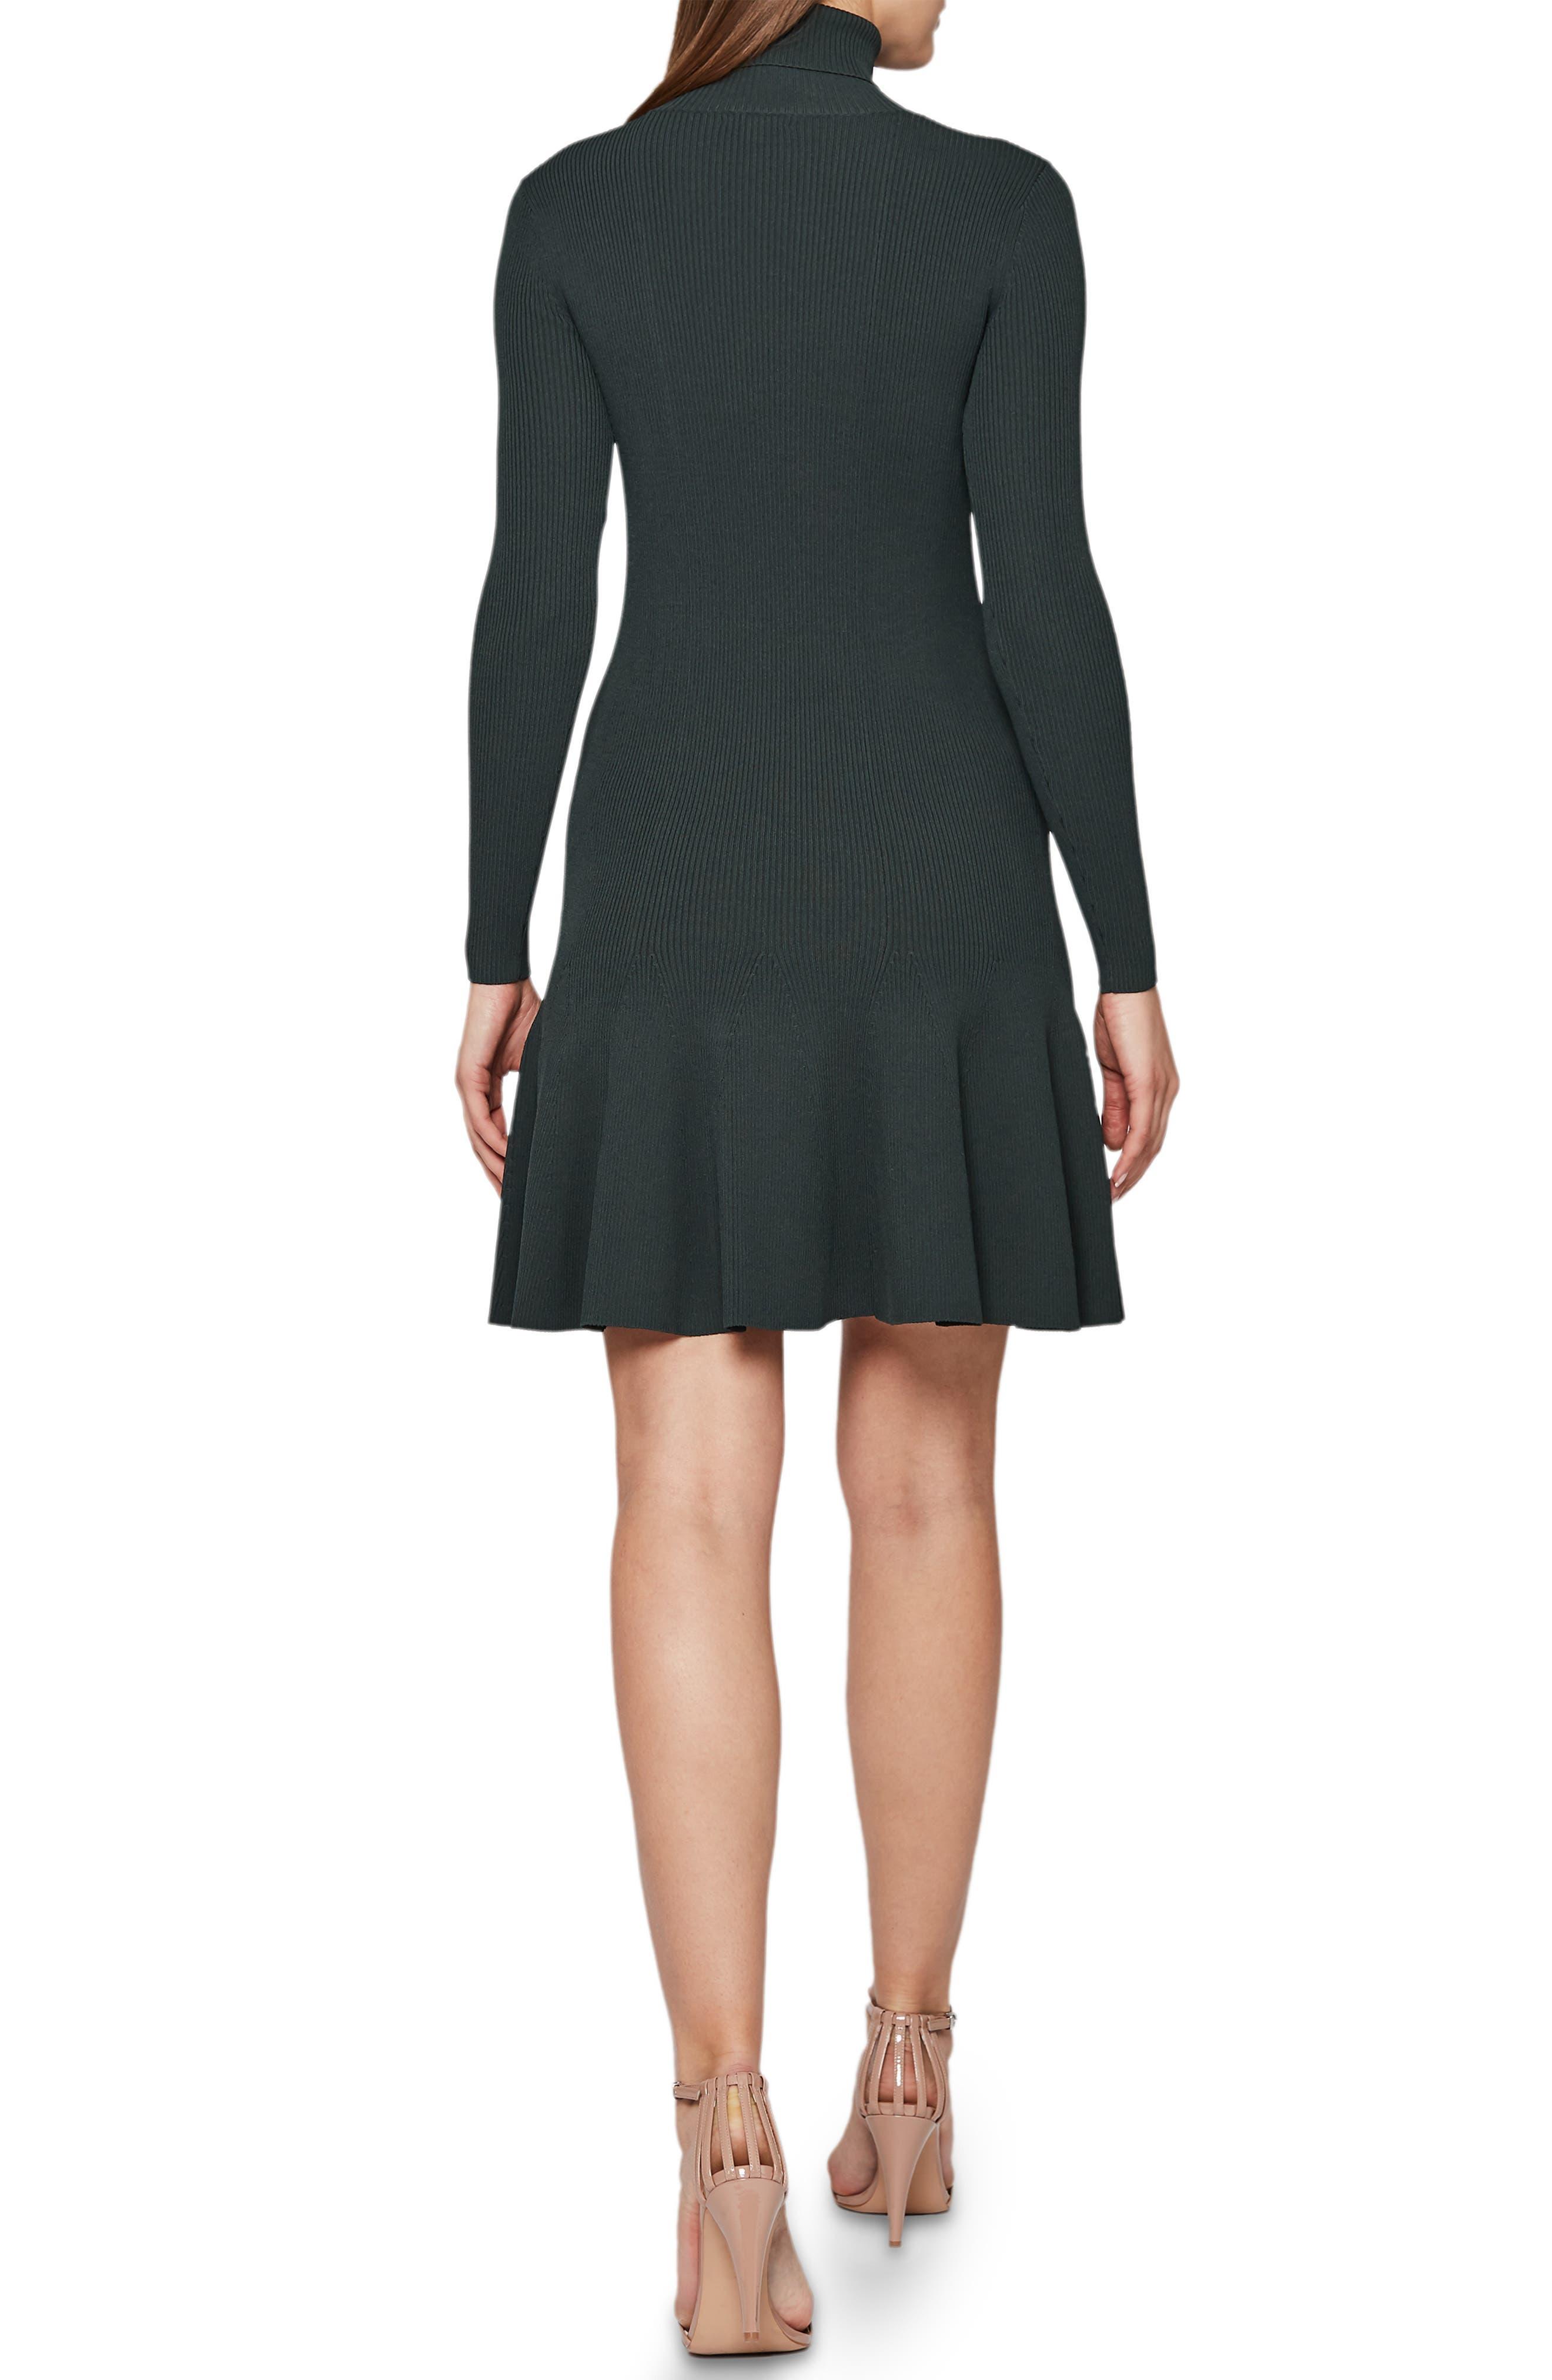 REISS,                             Mimi Turtleneck Sweater Dress,                             Alternate thumbnail 2, color,                             GREEN